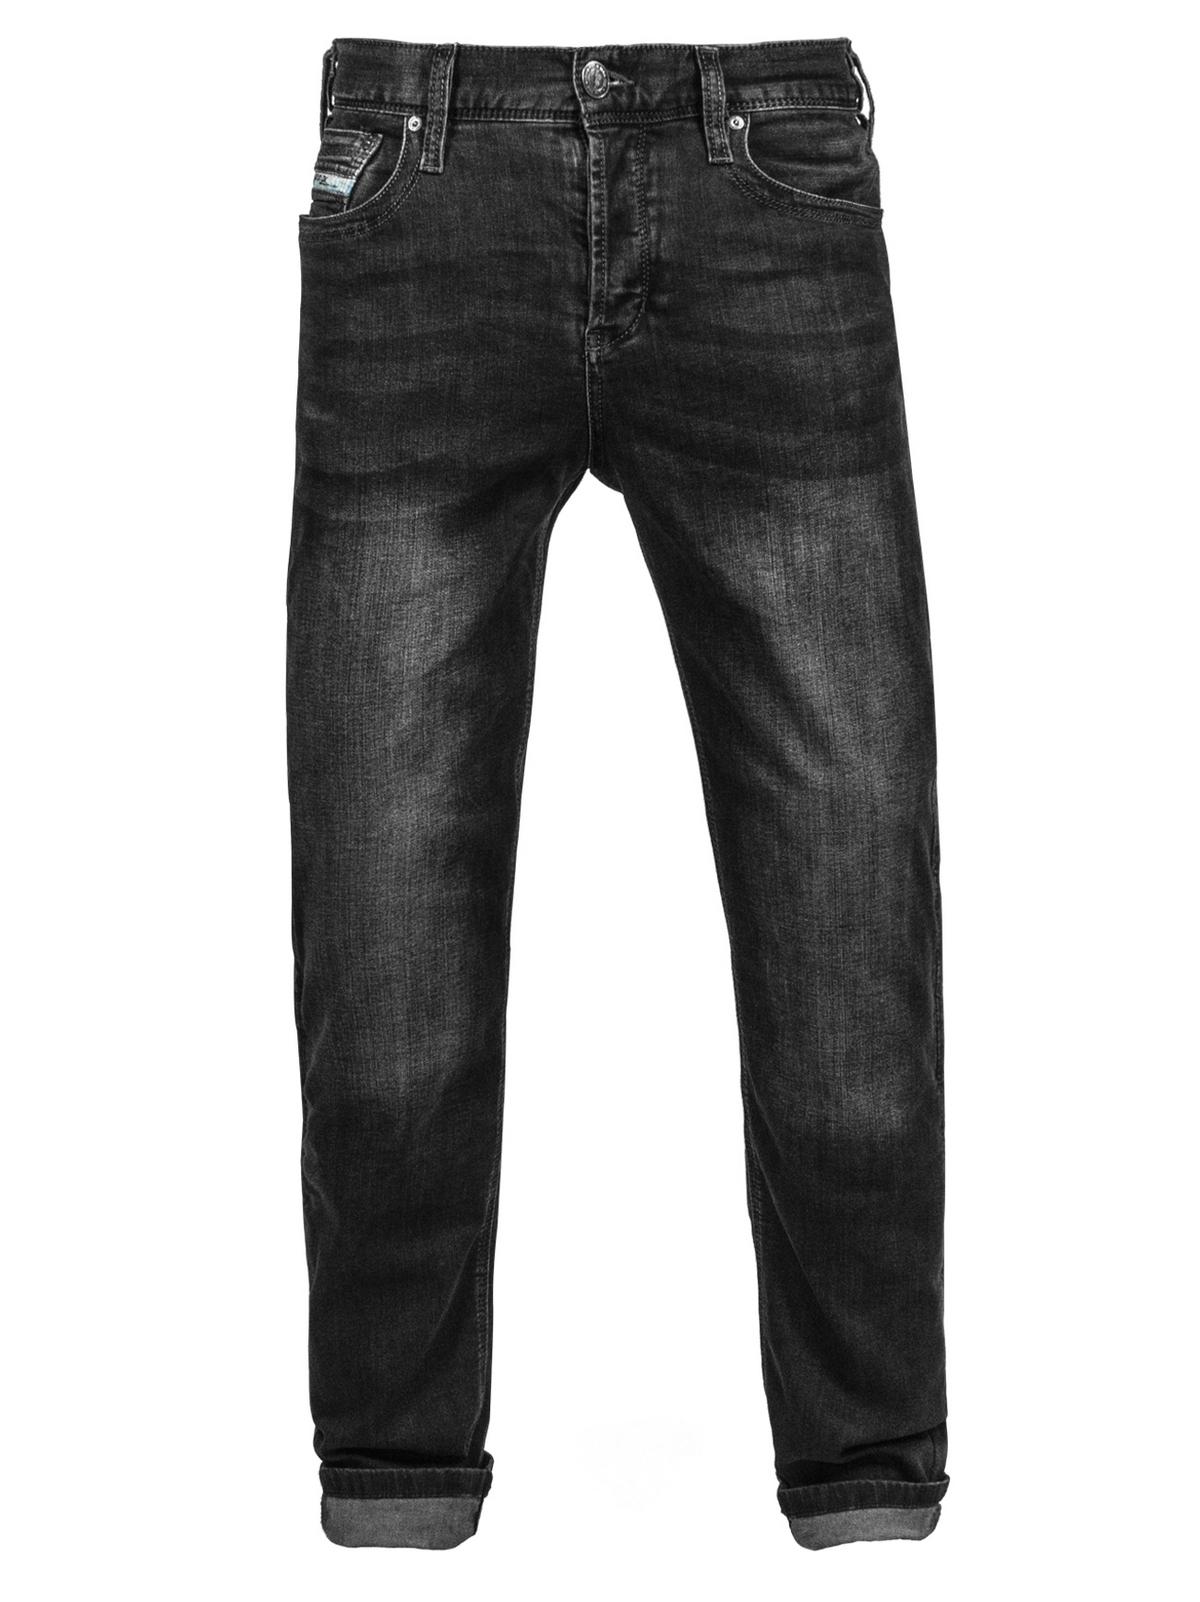 John Doe Motorrad Hose Jeans Denim Kamikaze Jeans Black-W44-L32